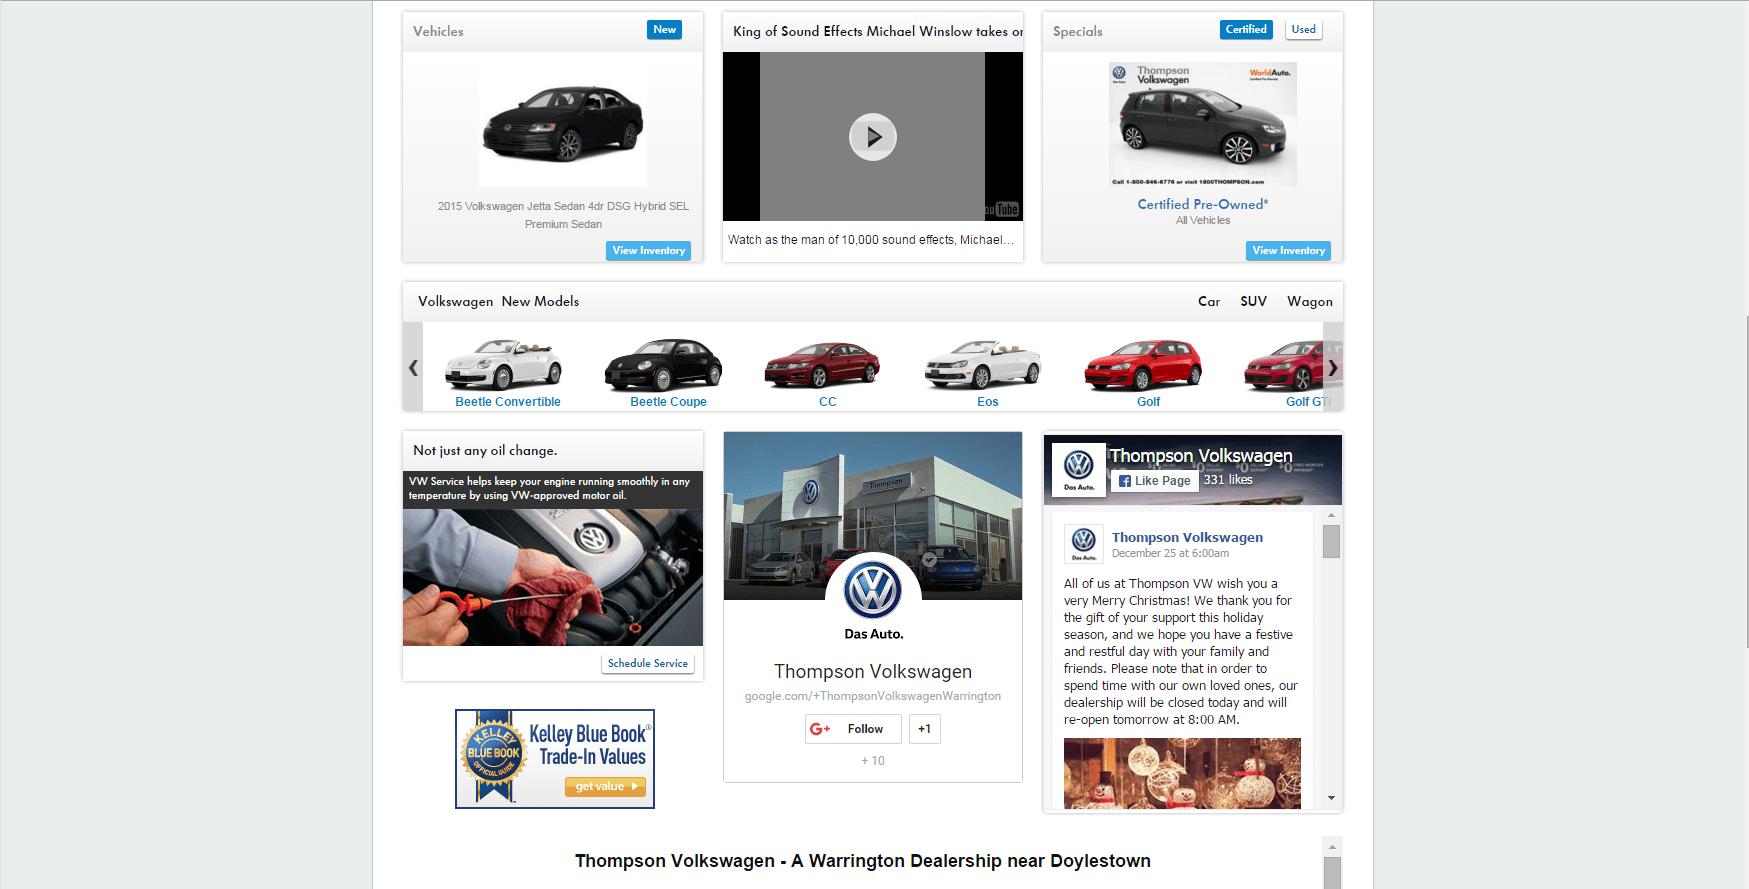 Thompson VW (Before) 1.2